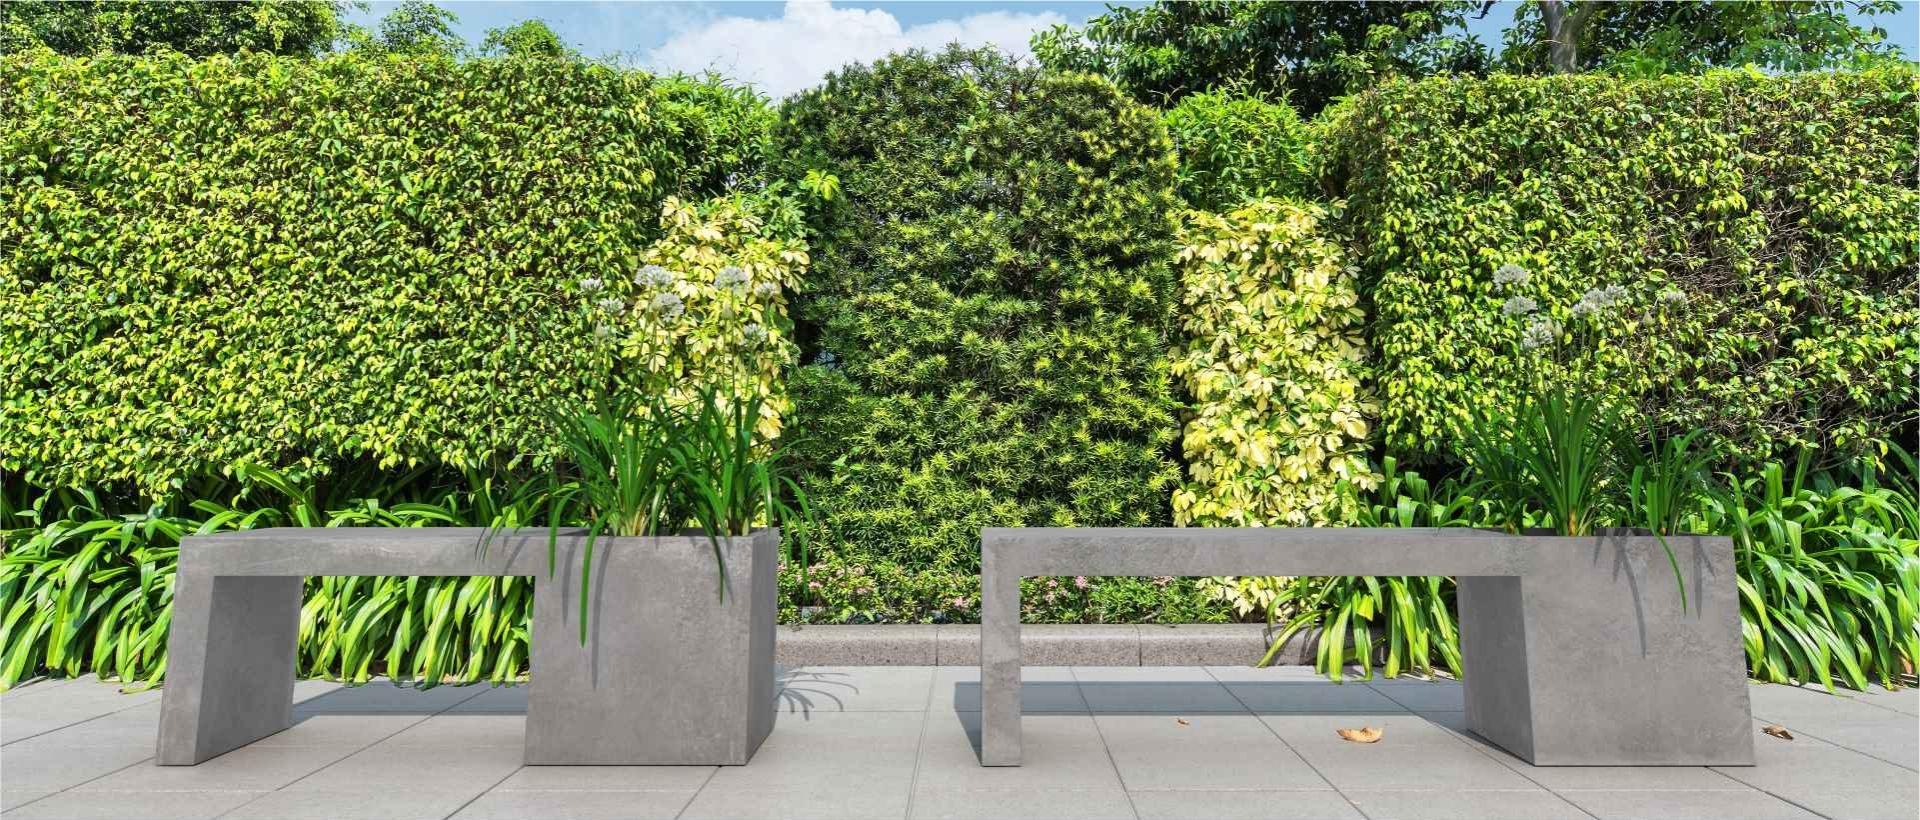 Bench-planter Regular, Cube slabs, Modern Line